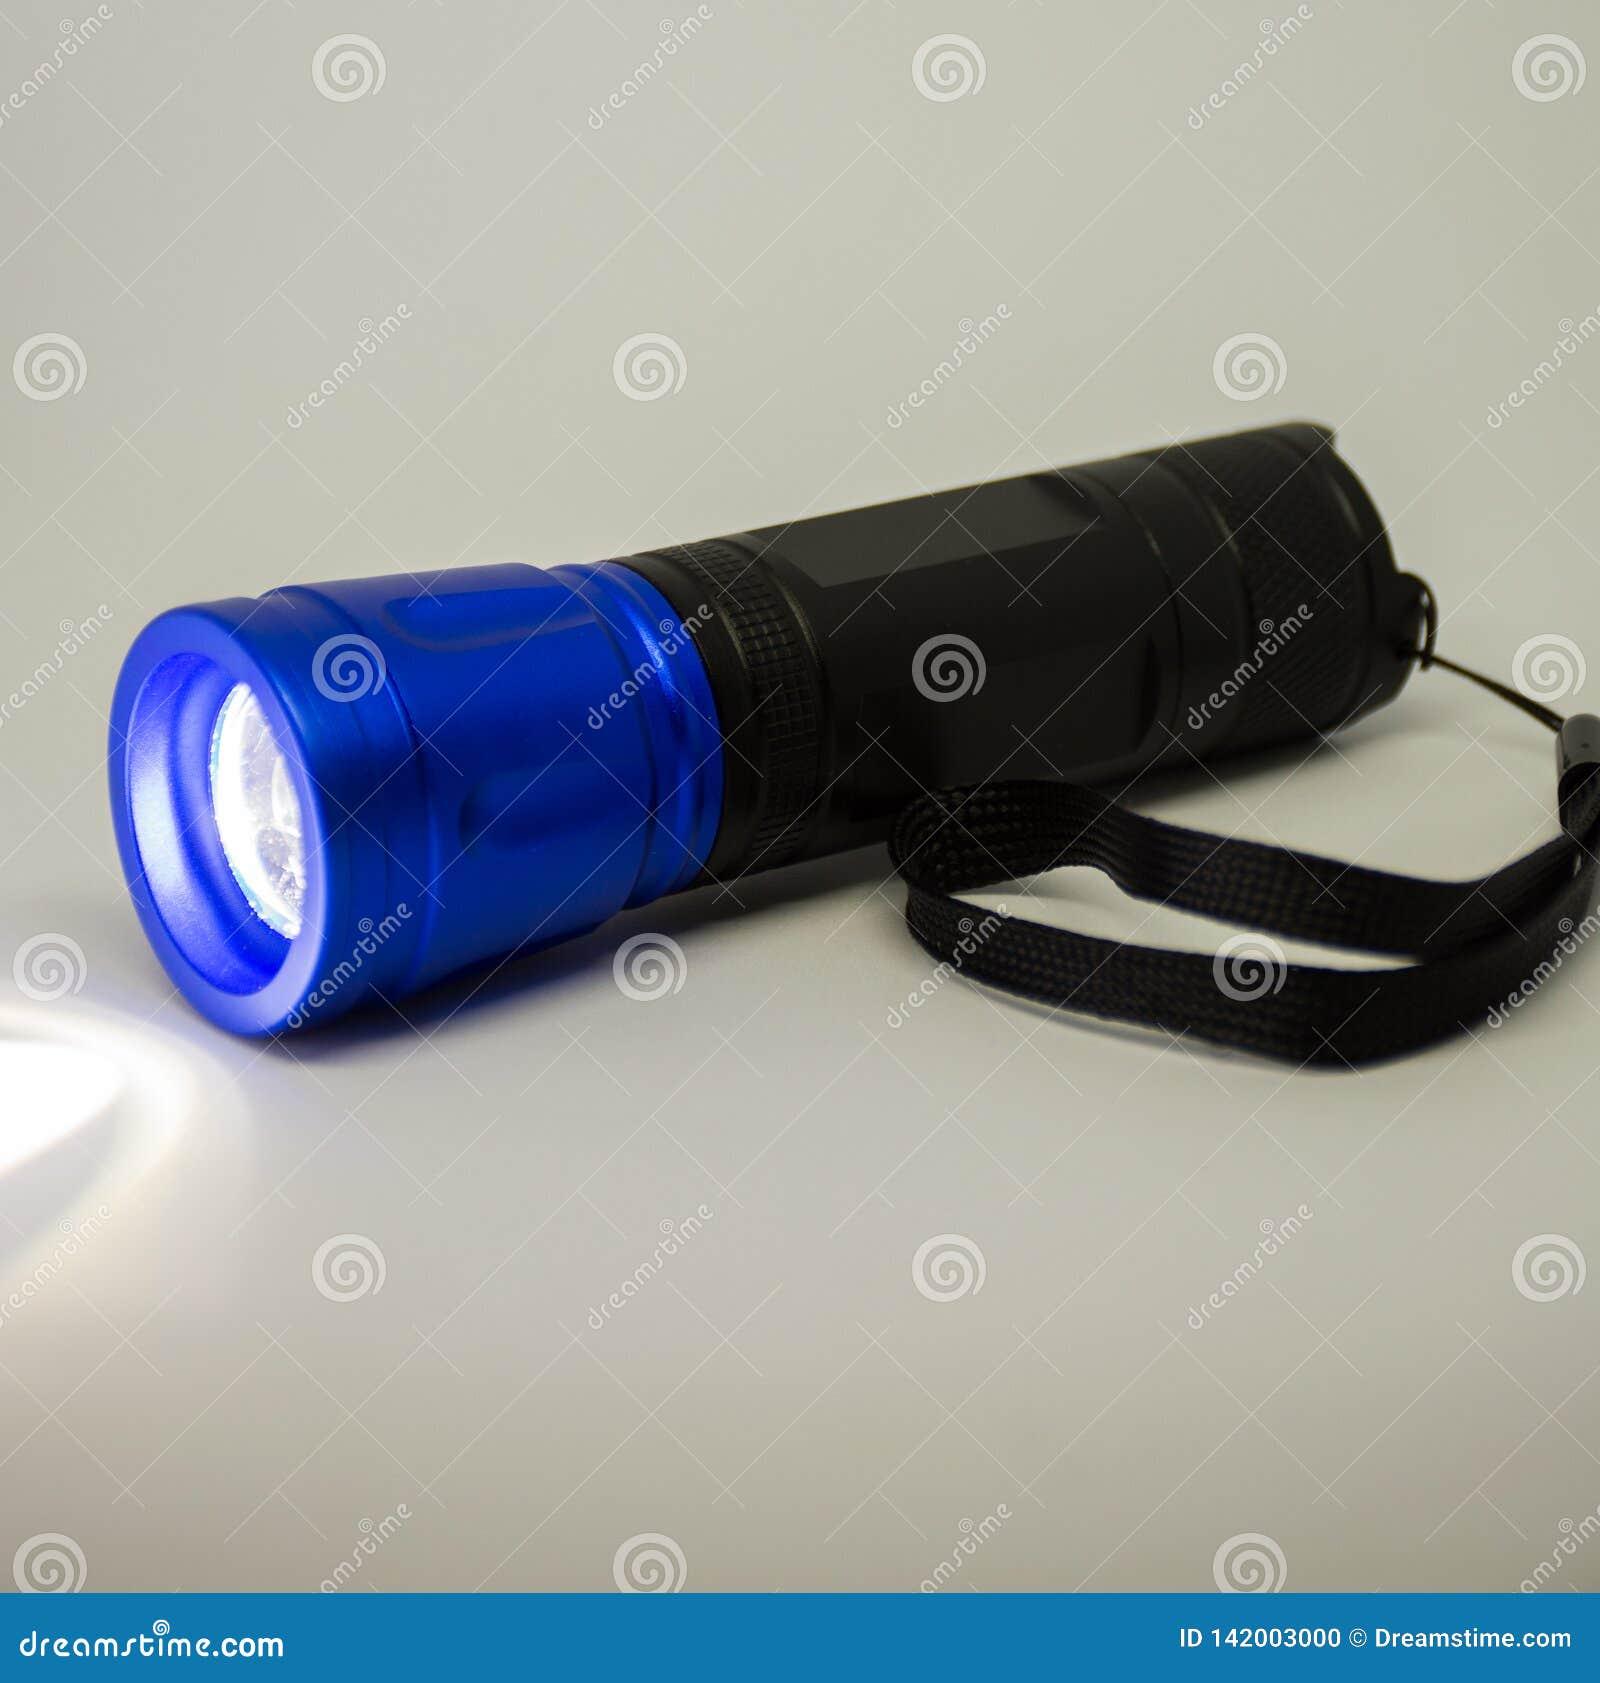 Portable flashlight or torchlight